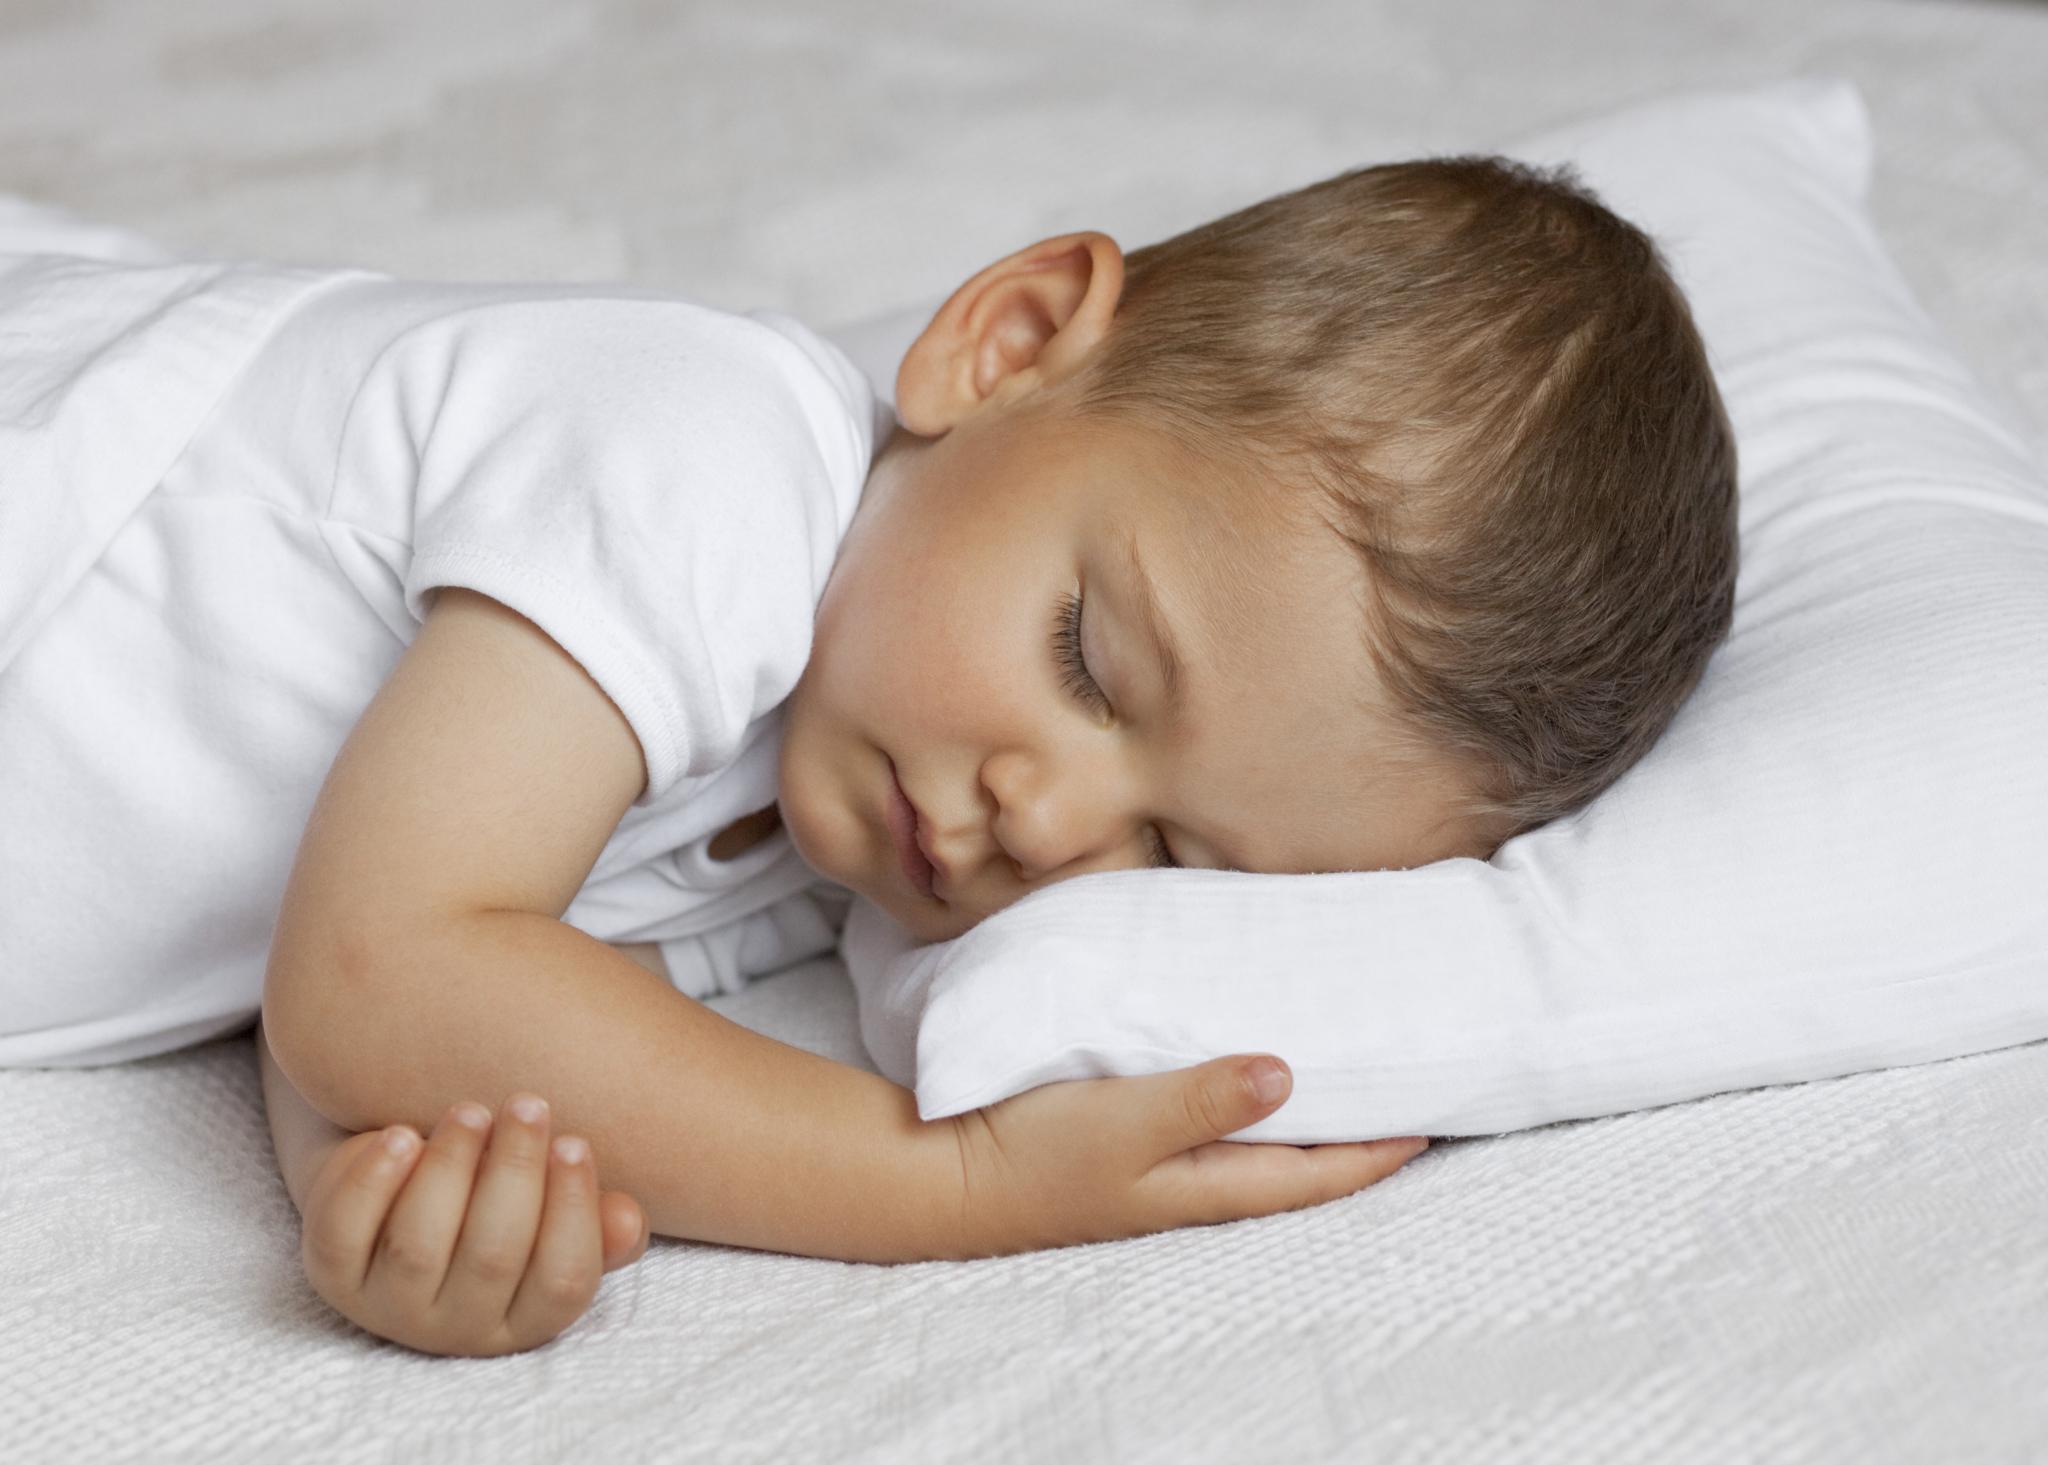 sleeping, sleeping habits, toddler, schedule, sleep schedule, wake up, bedtime, tired, positive association, ways to improve your toddlers sleeping patterns, toddlers, toddlers sleeping patterns